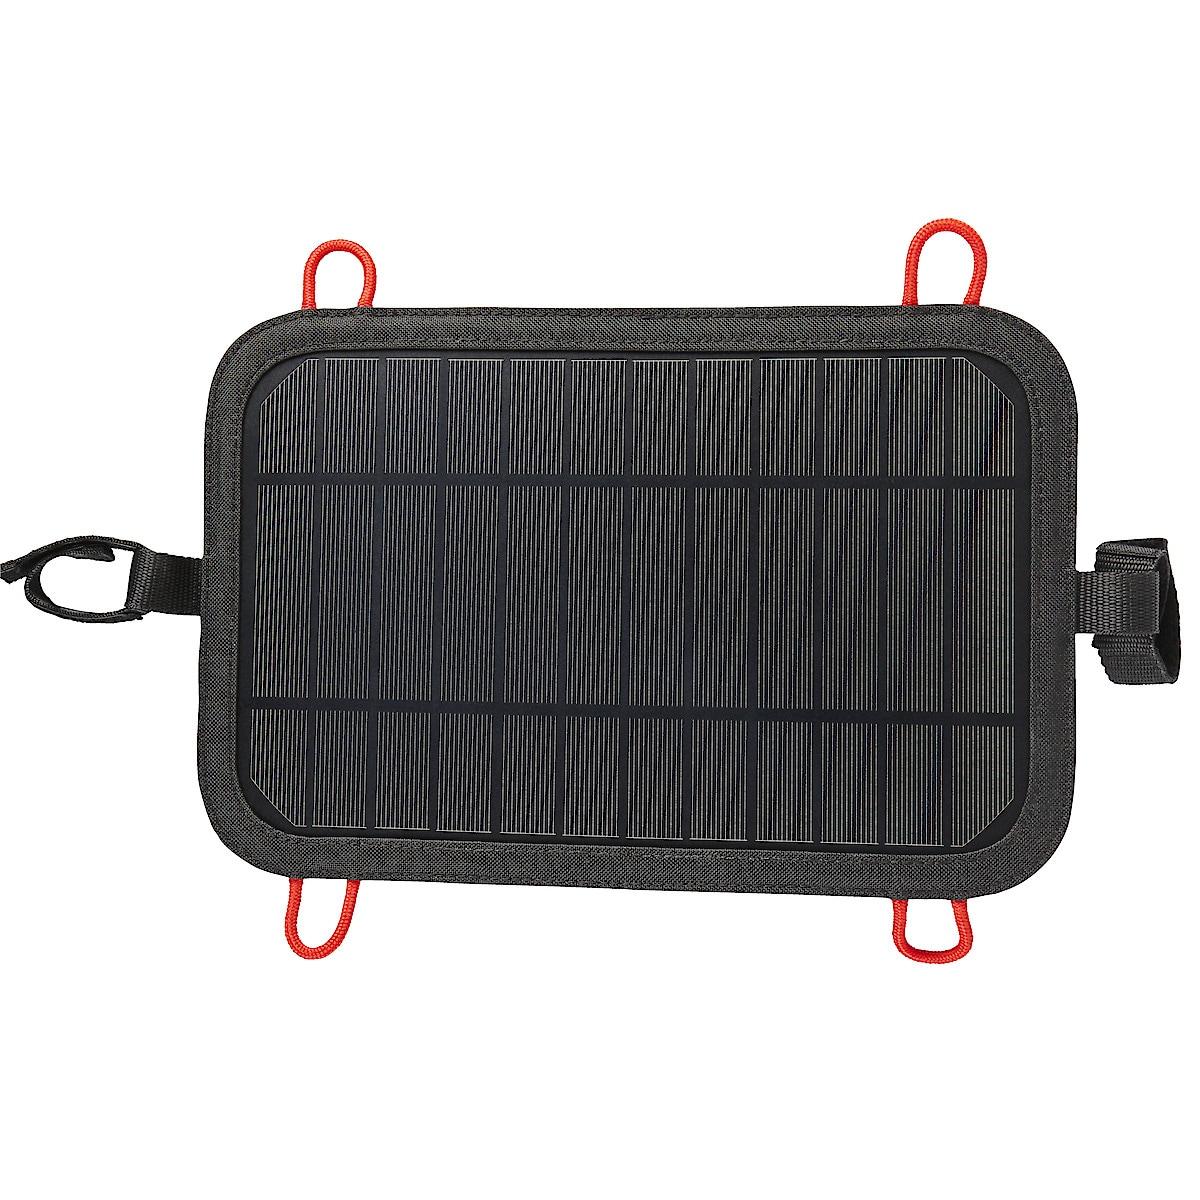 Solcellsladdare med USB 6 W Exibel